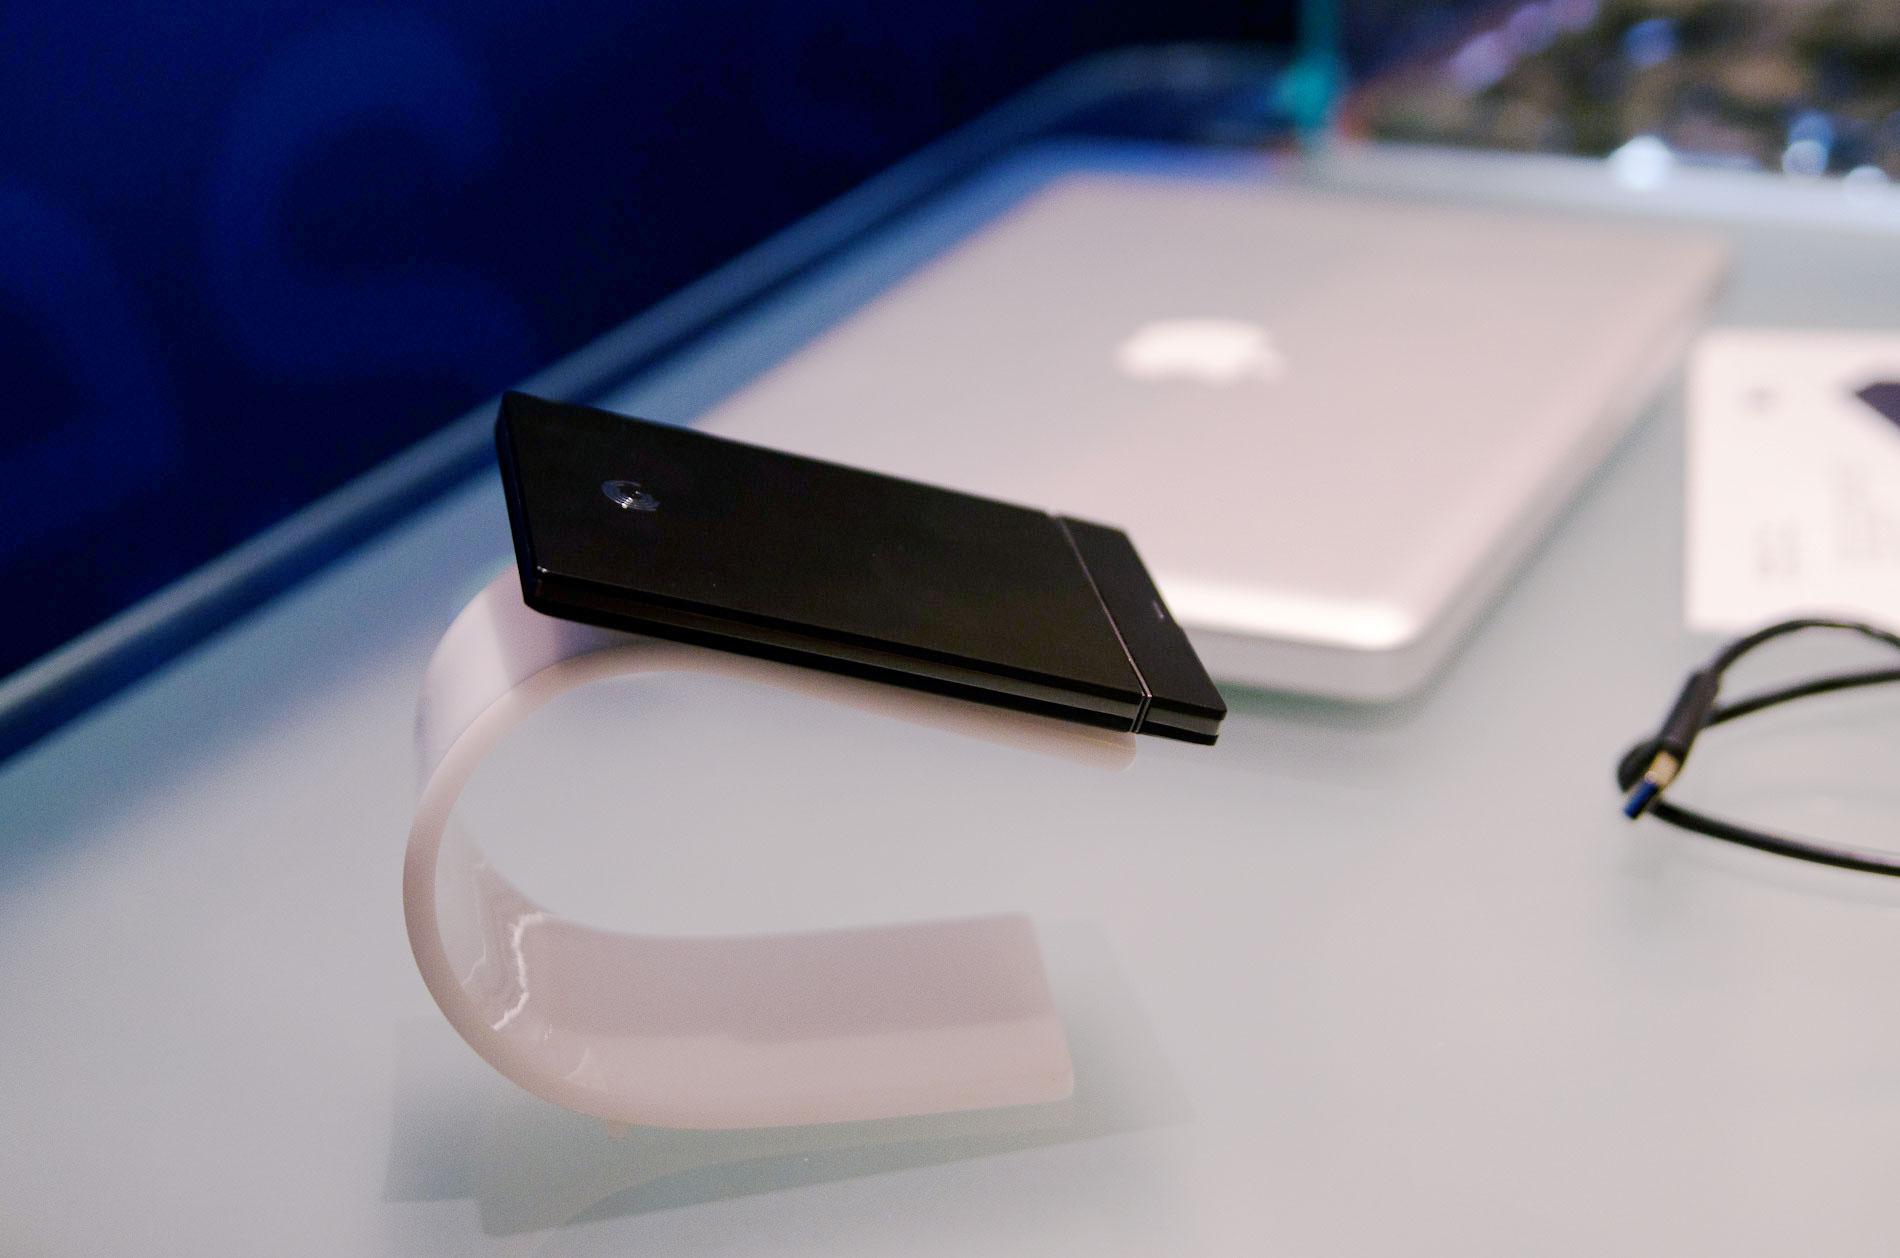 how to put stuff on external hard drive mac